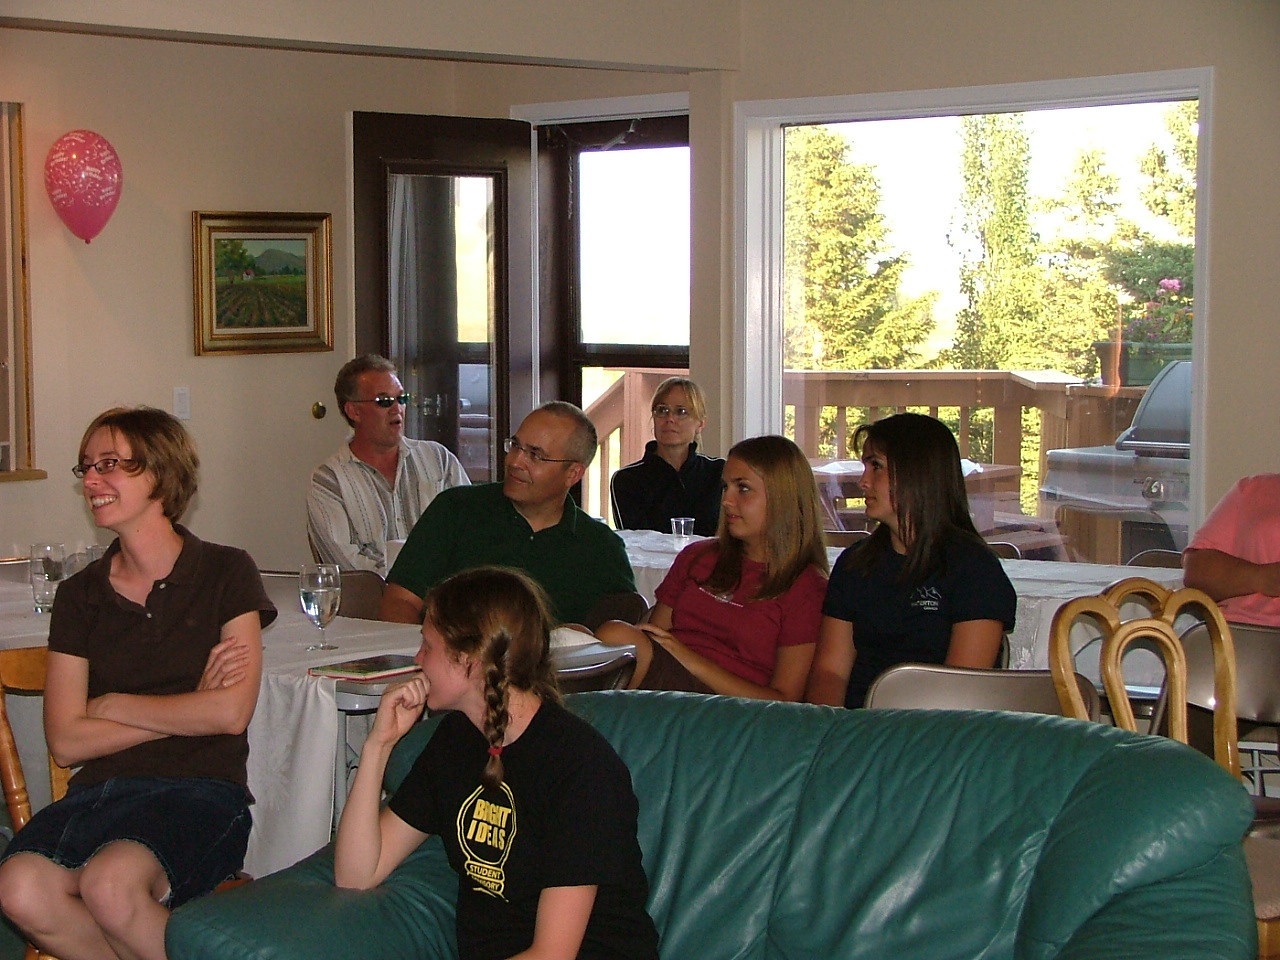 (back) Bill, Karen (middle) Kent, Abby, Annie (front) Christy, Kristi